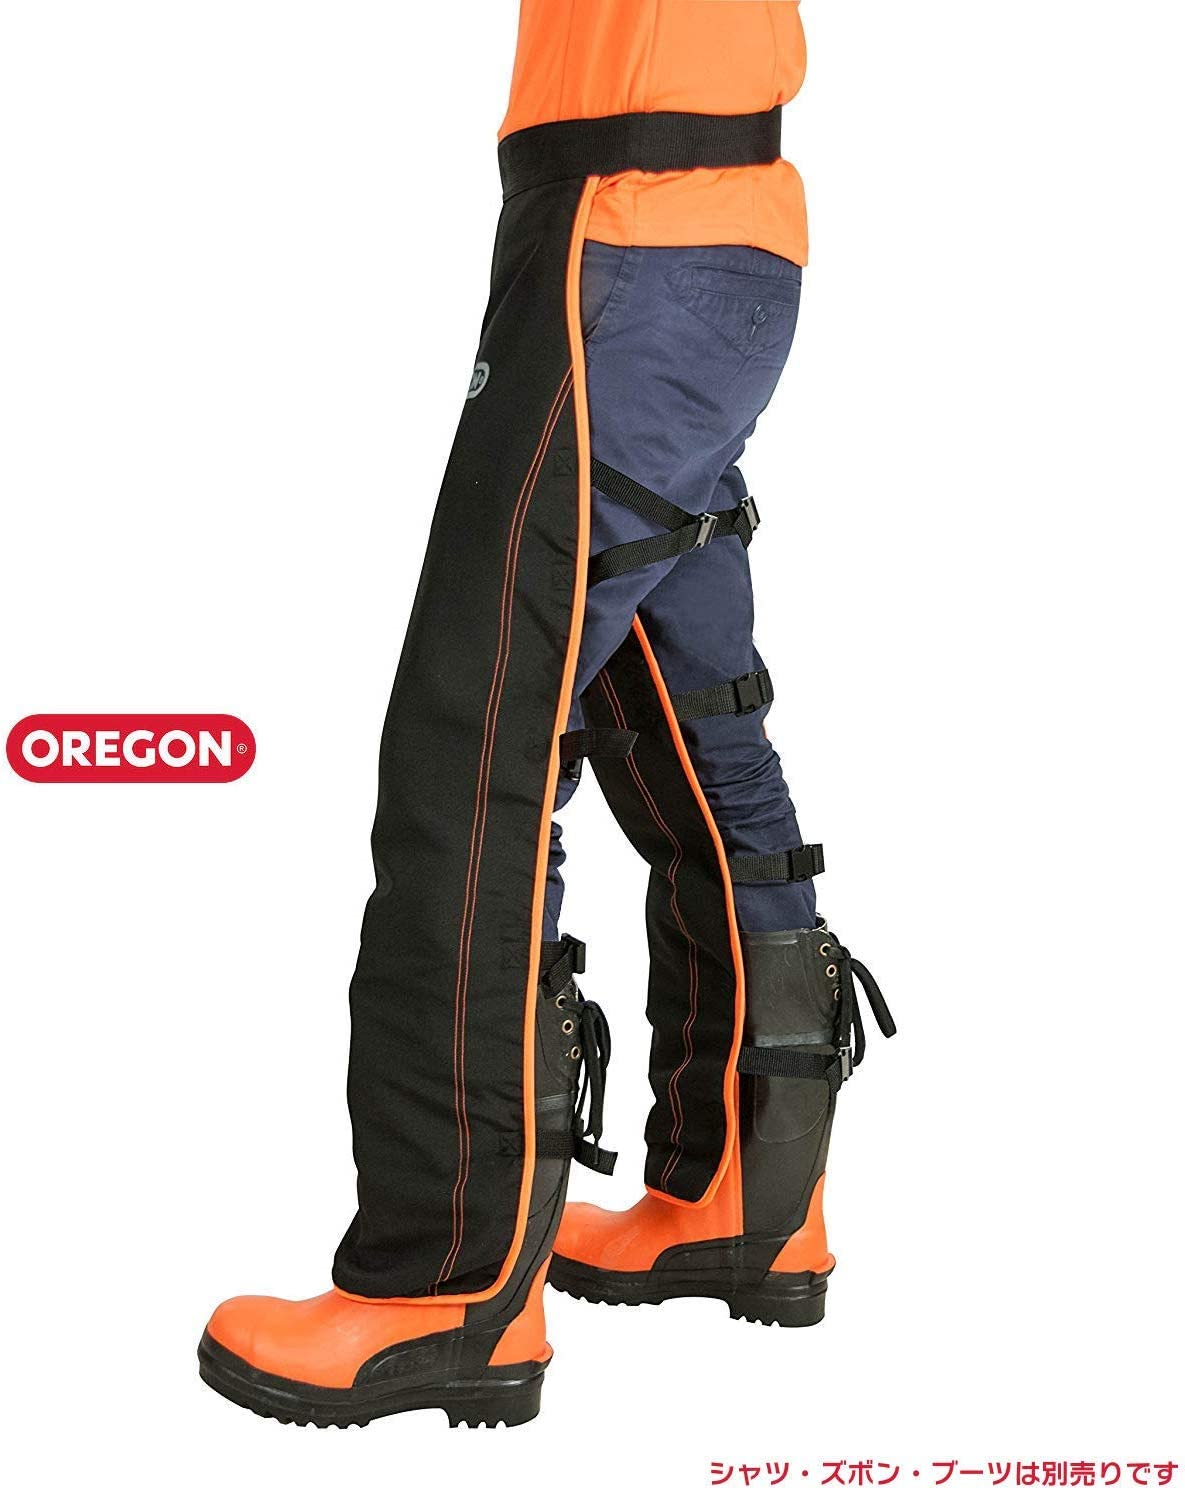 OREGON(オレゴン) 軽量 チャップス 575780